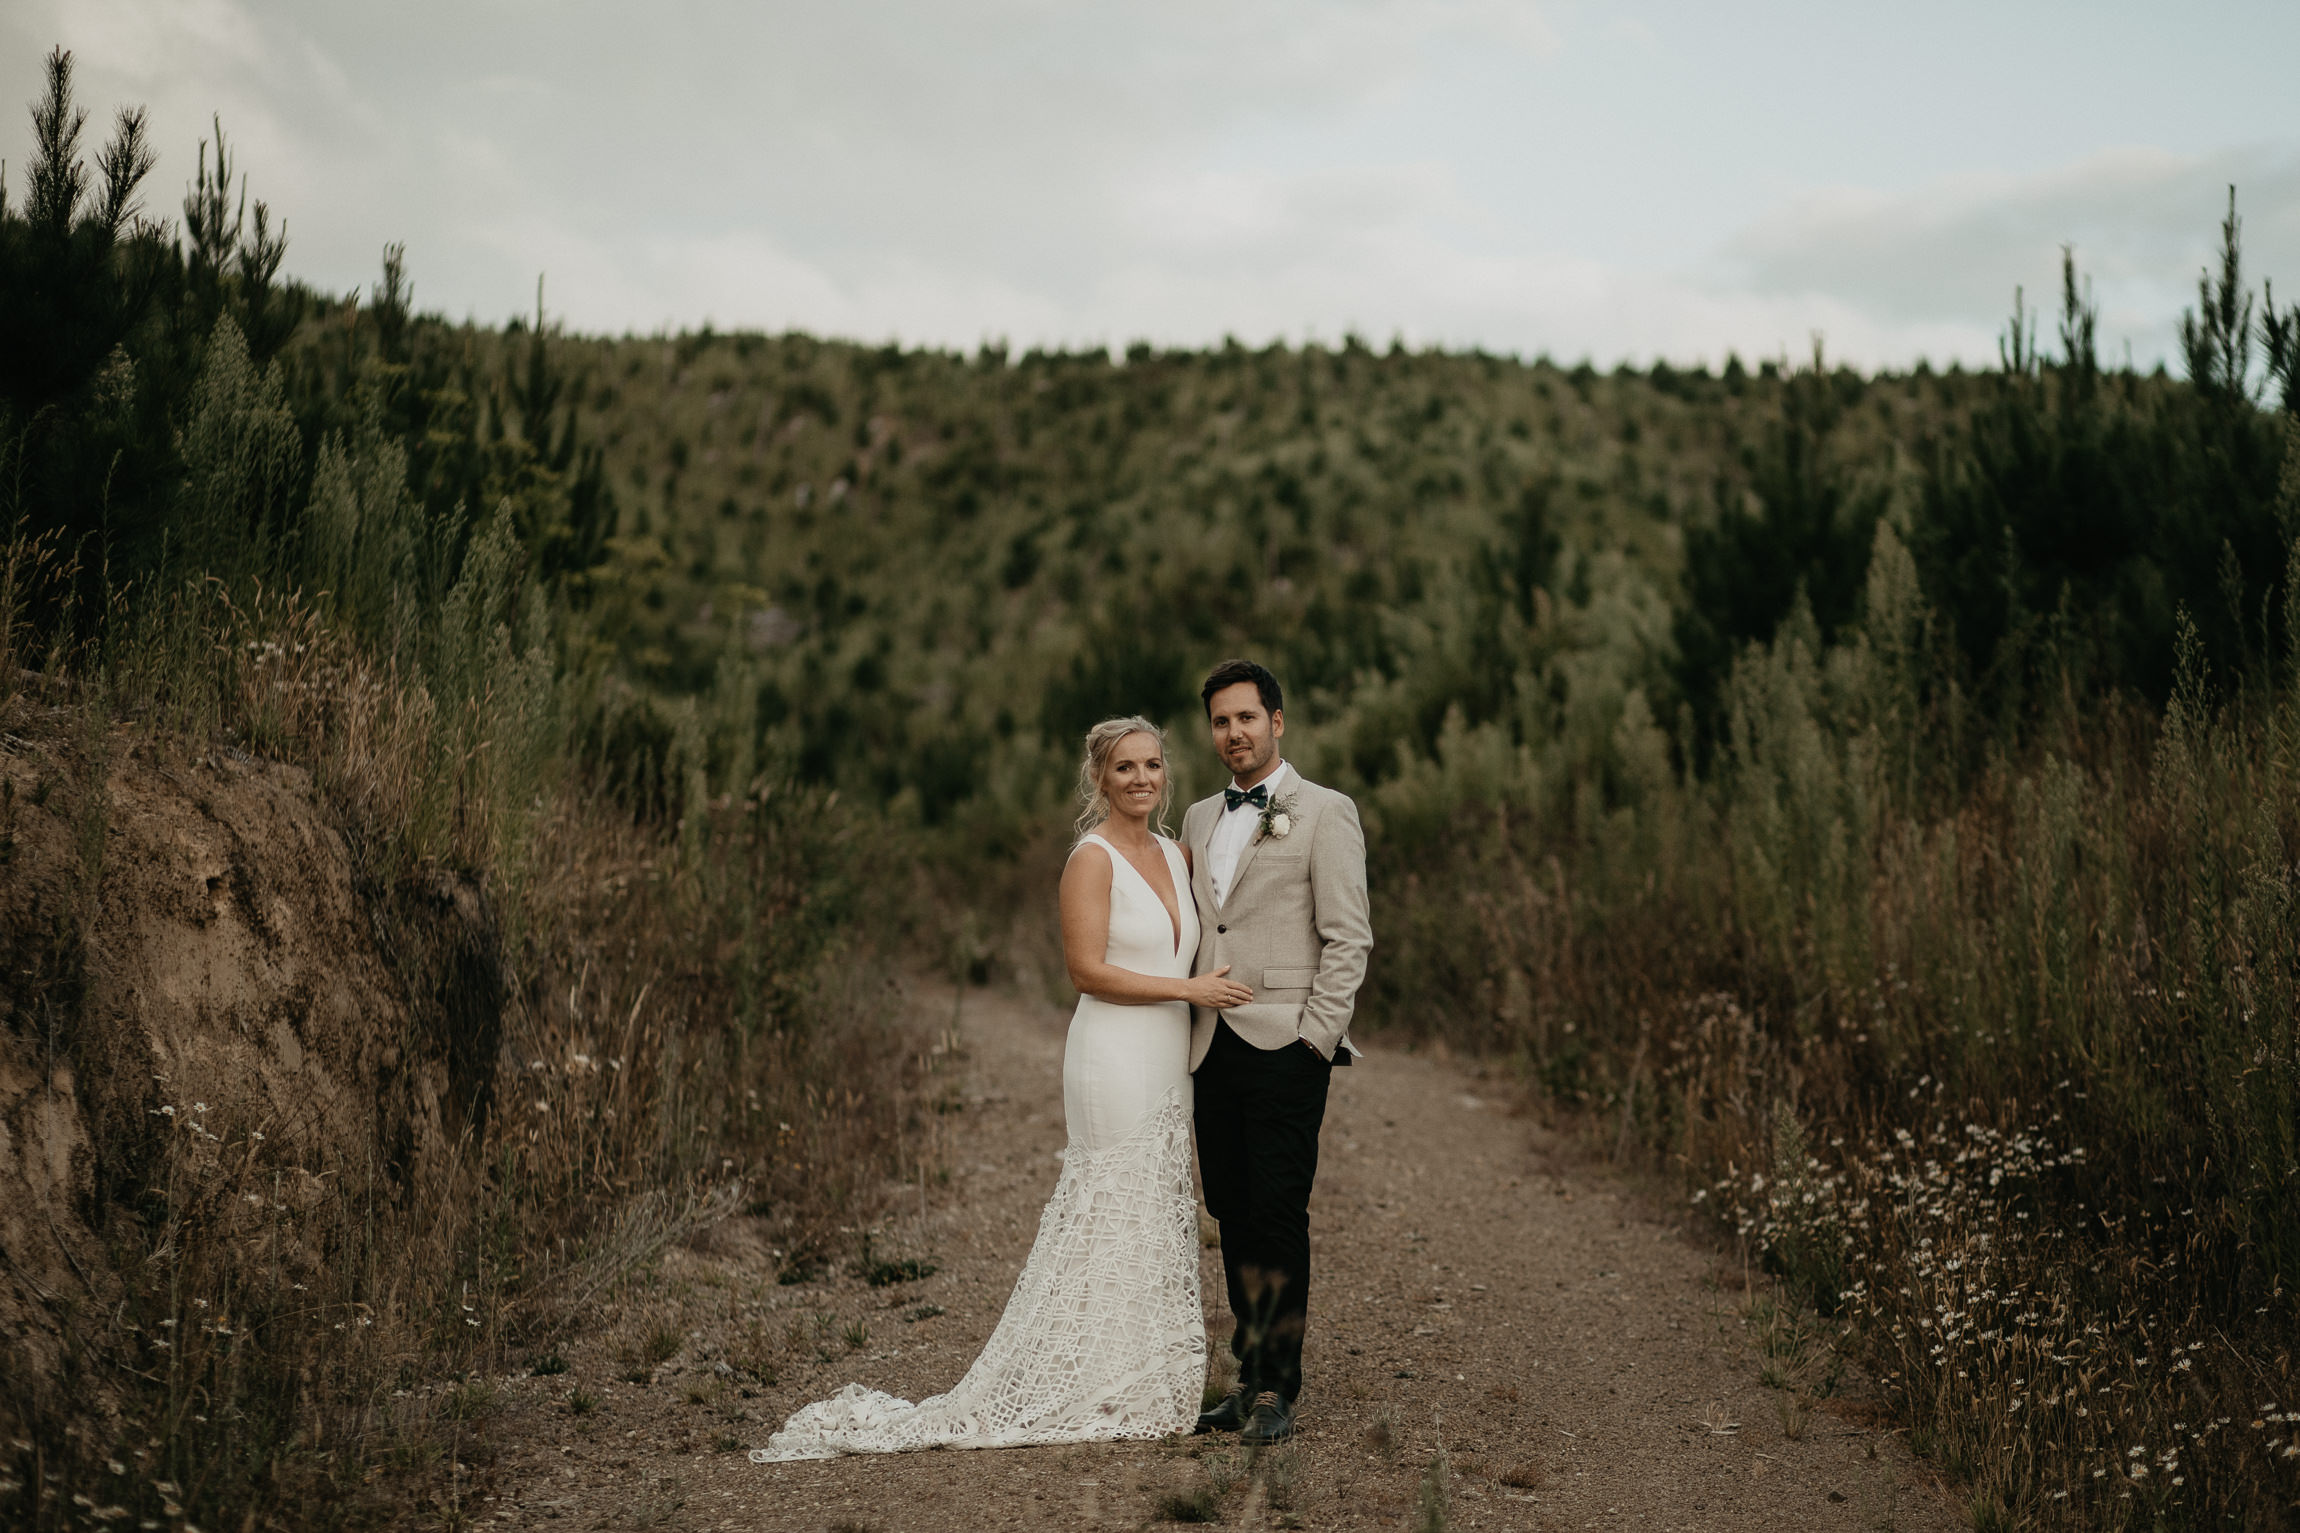 oldforestschool-wedding-blog-170.jpg